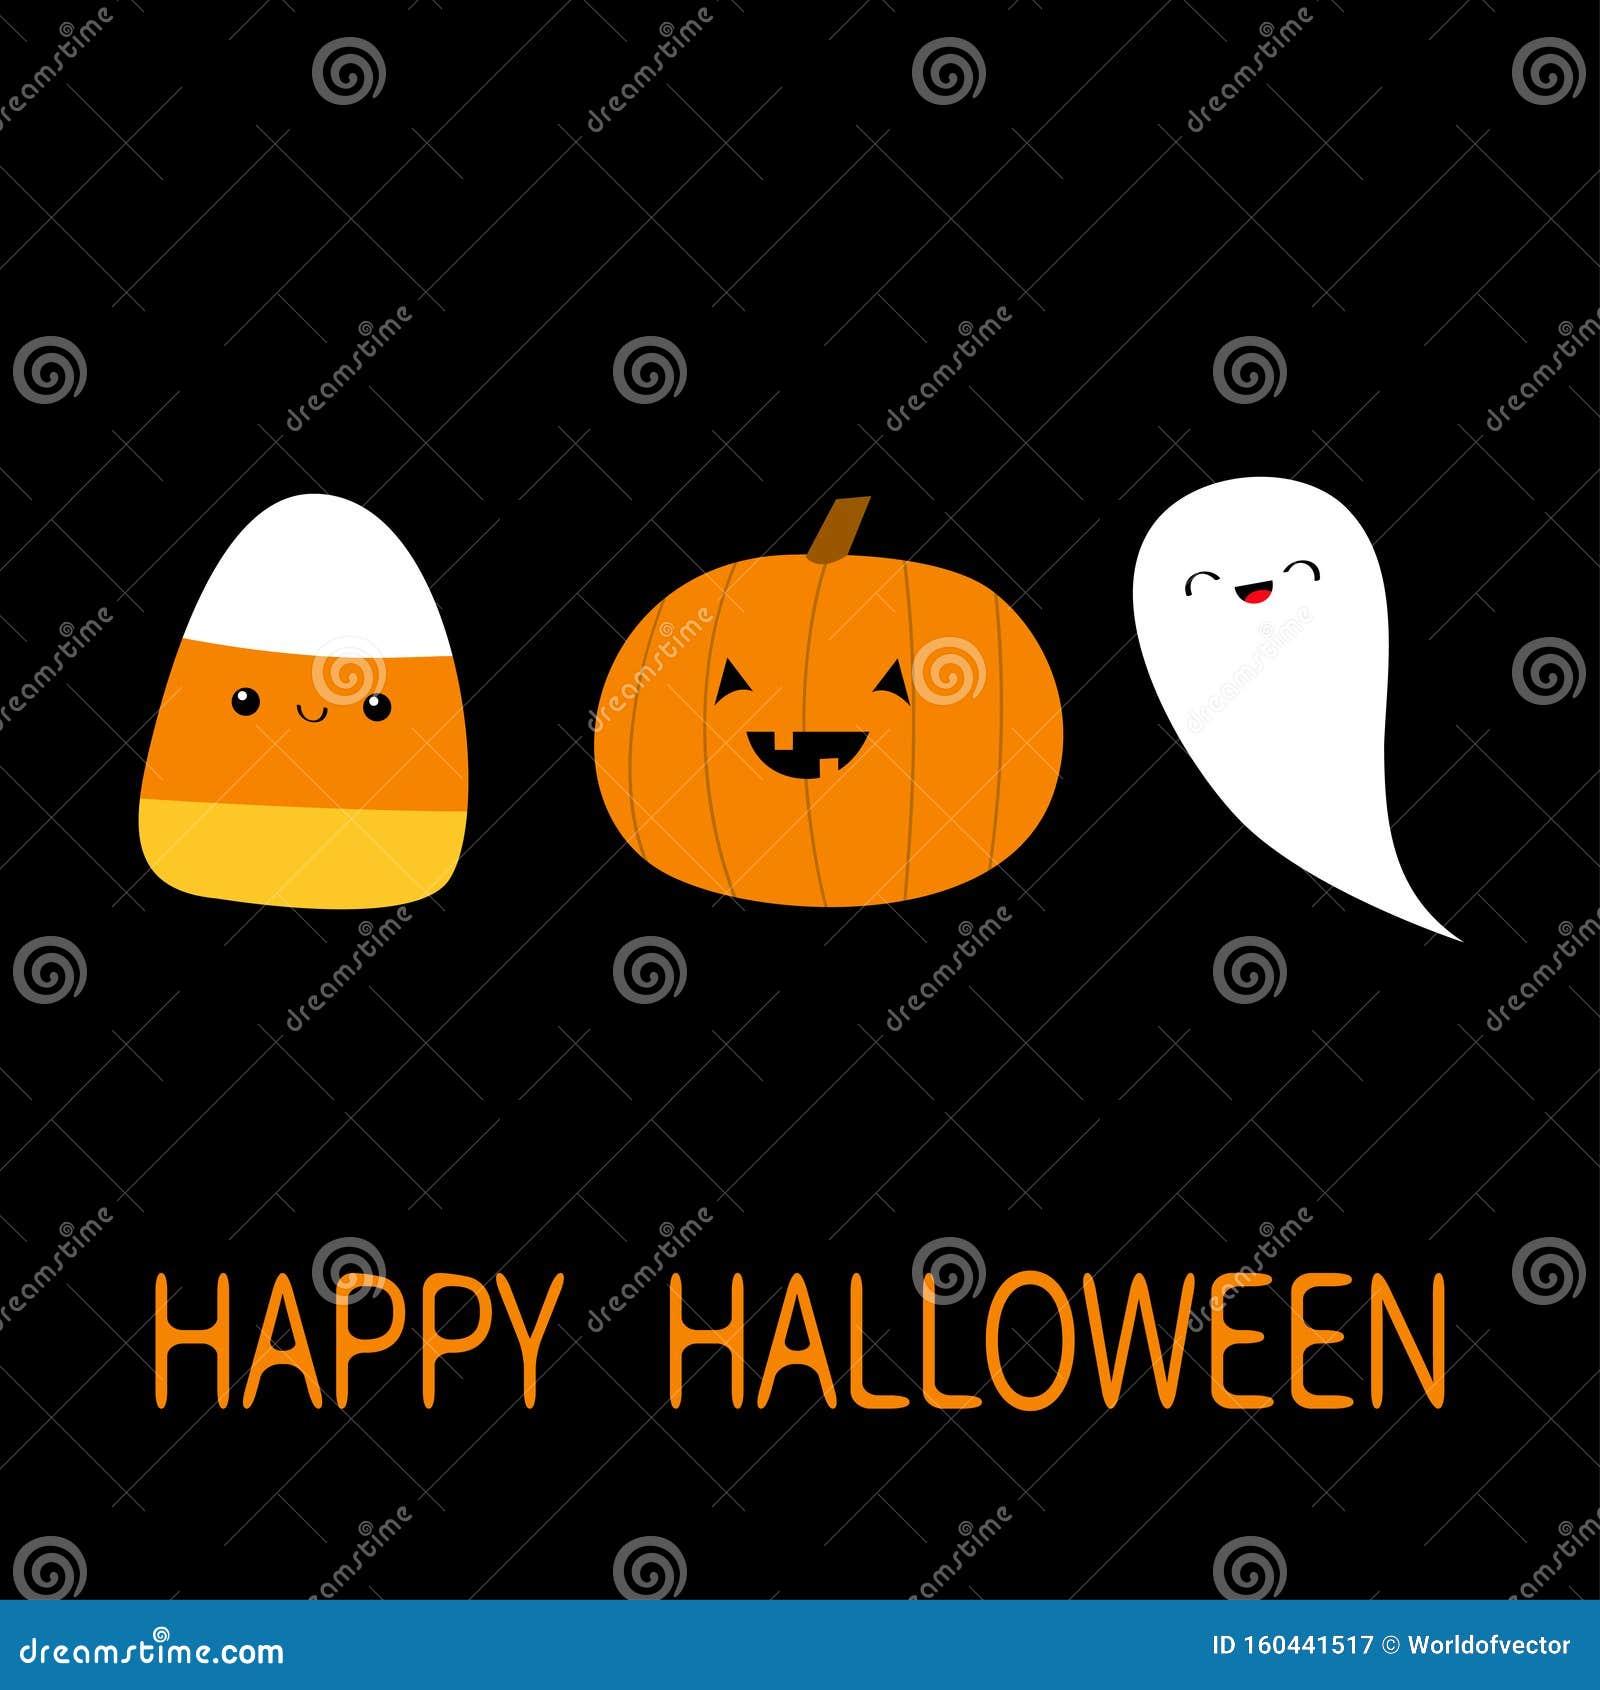 Candy Corn, Pumpkin, Ghost Spirit With Face. Cute Cartoon